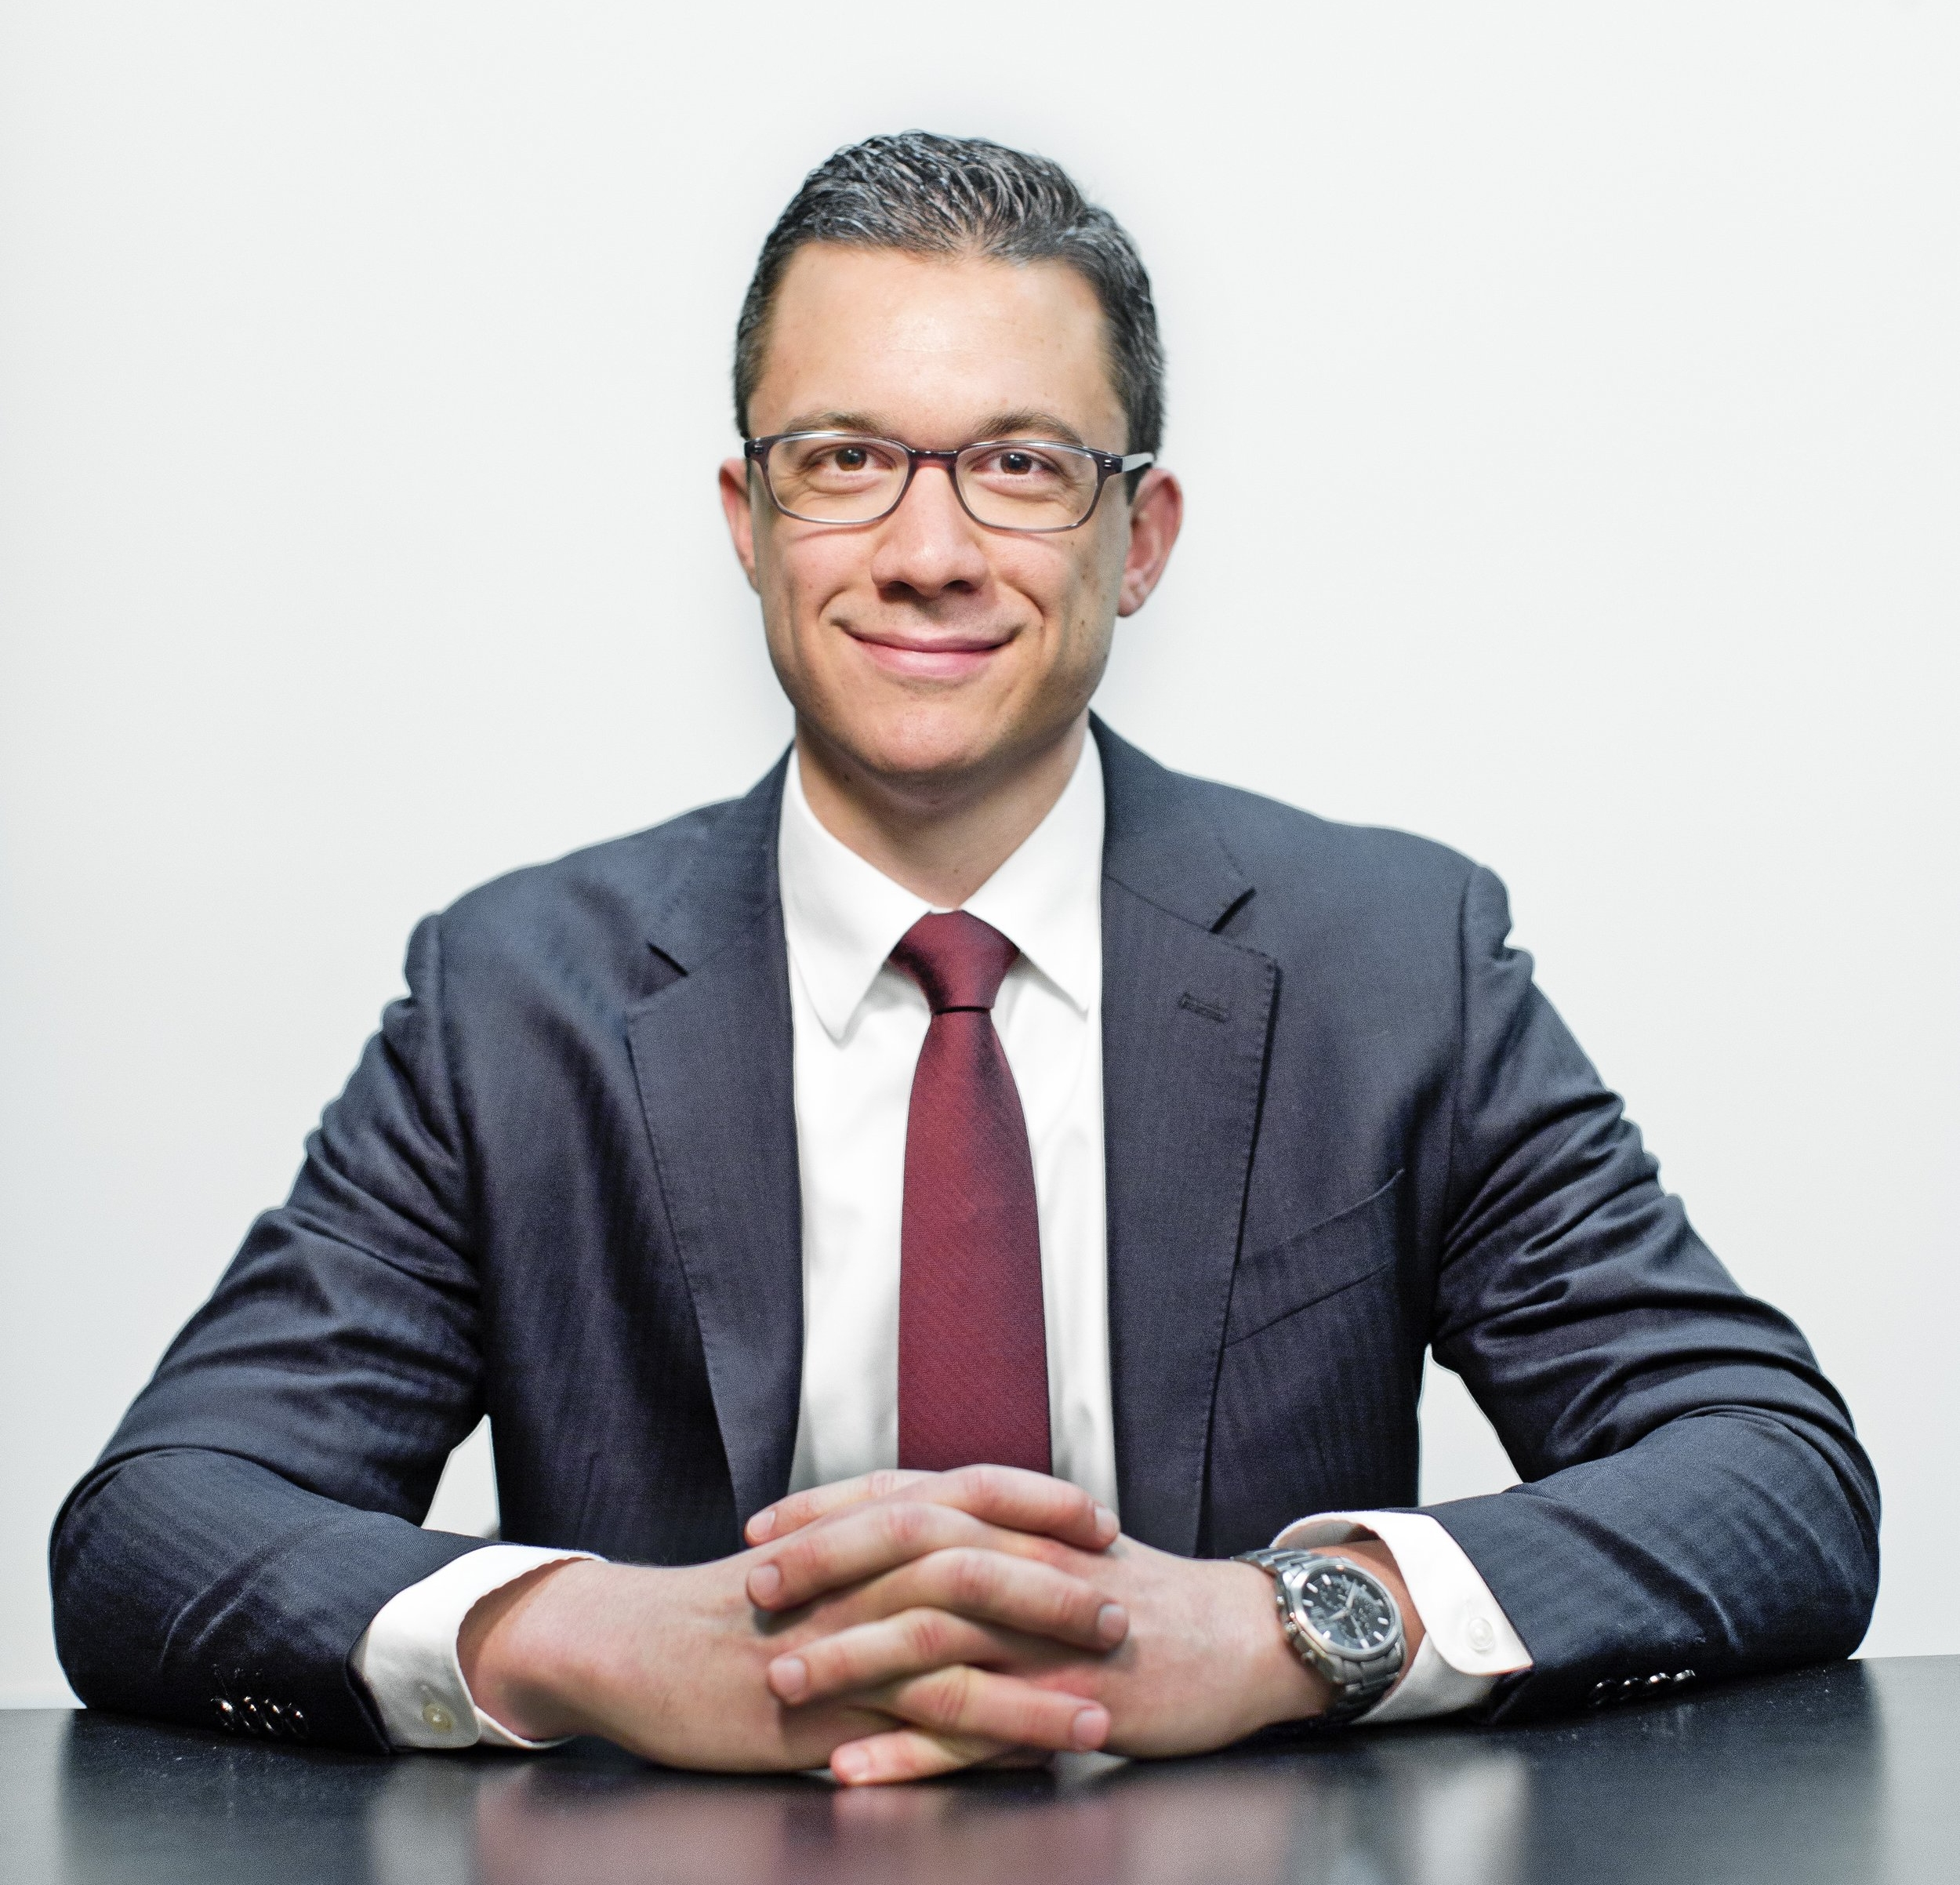 Zak T. Goldstein, Esq. - Philadelphia Harassment Defense Lawyer